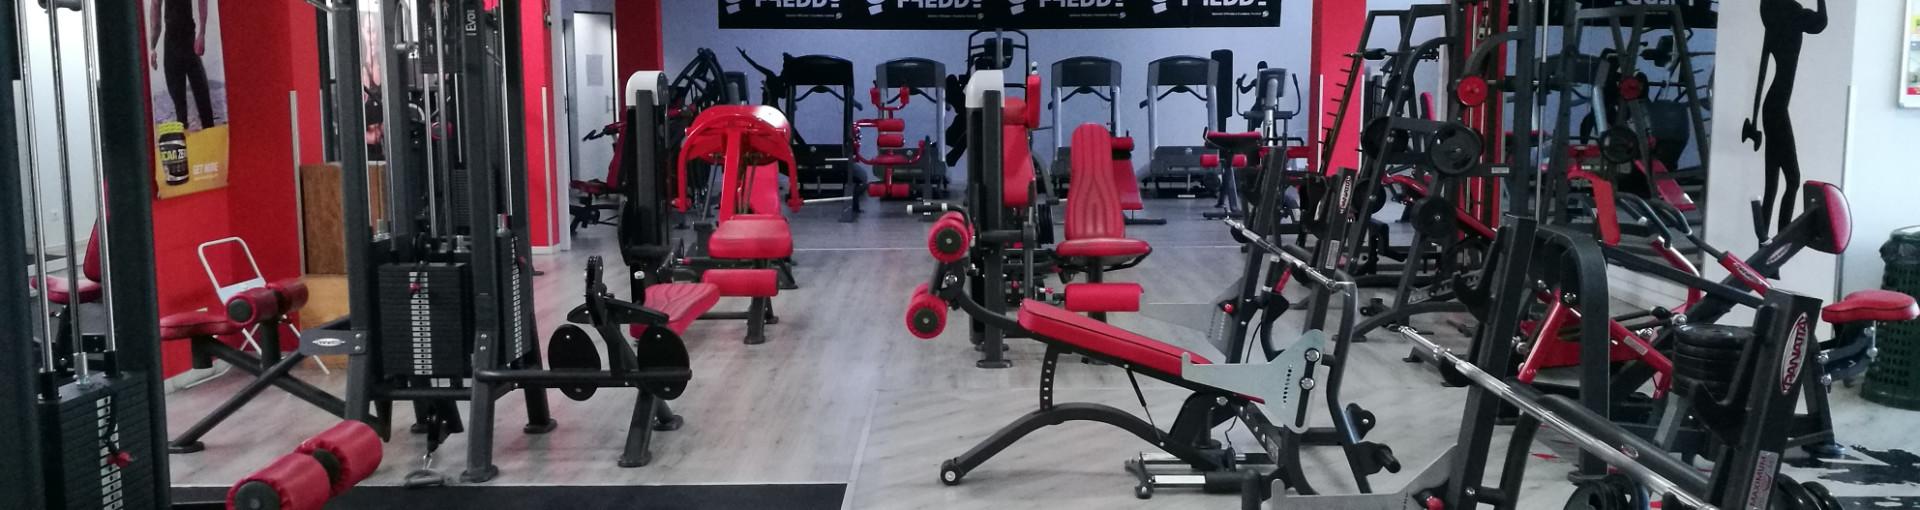 Iron Fitness  - Caltagirone